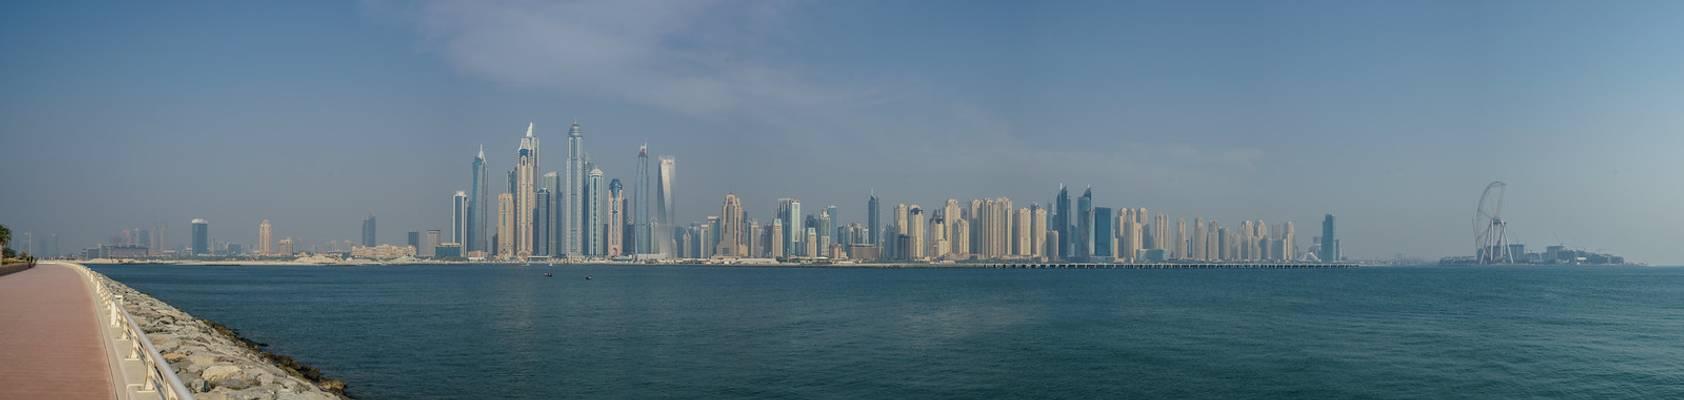 Dubai Marina 3